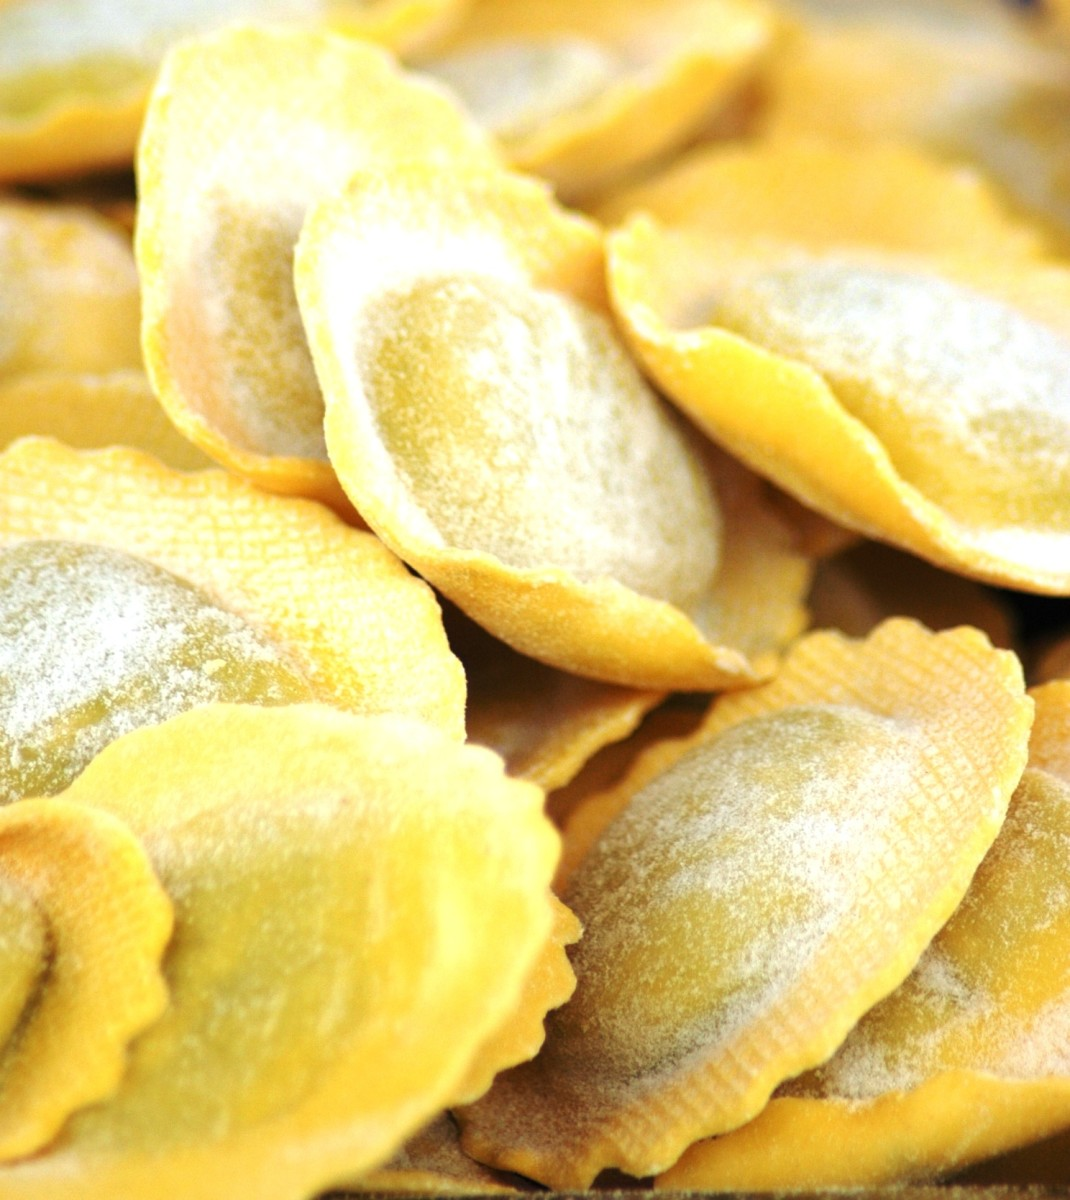 gluten-free-pasta-recipe-quinoa-flour-rice-flour-buckwheat-flour